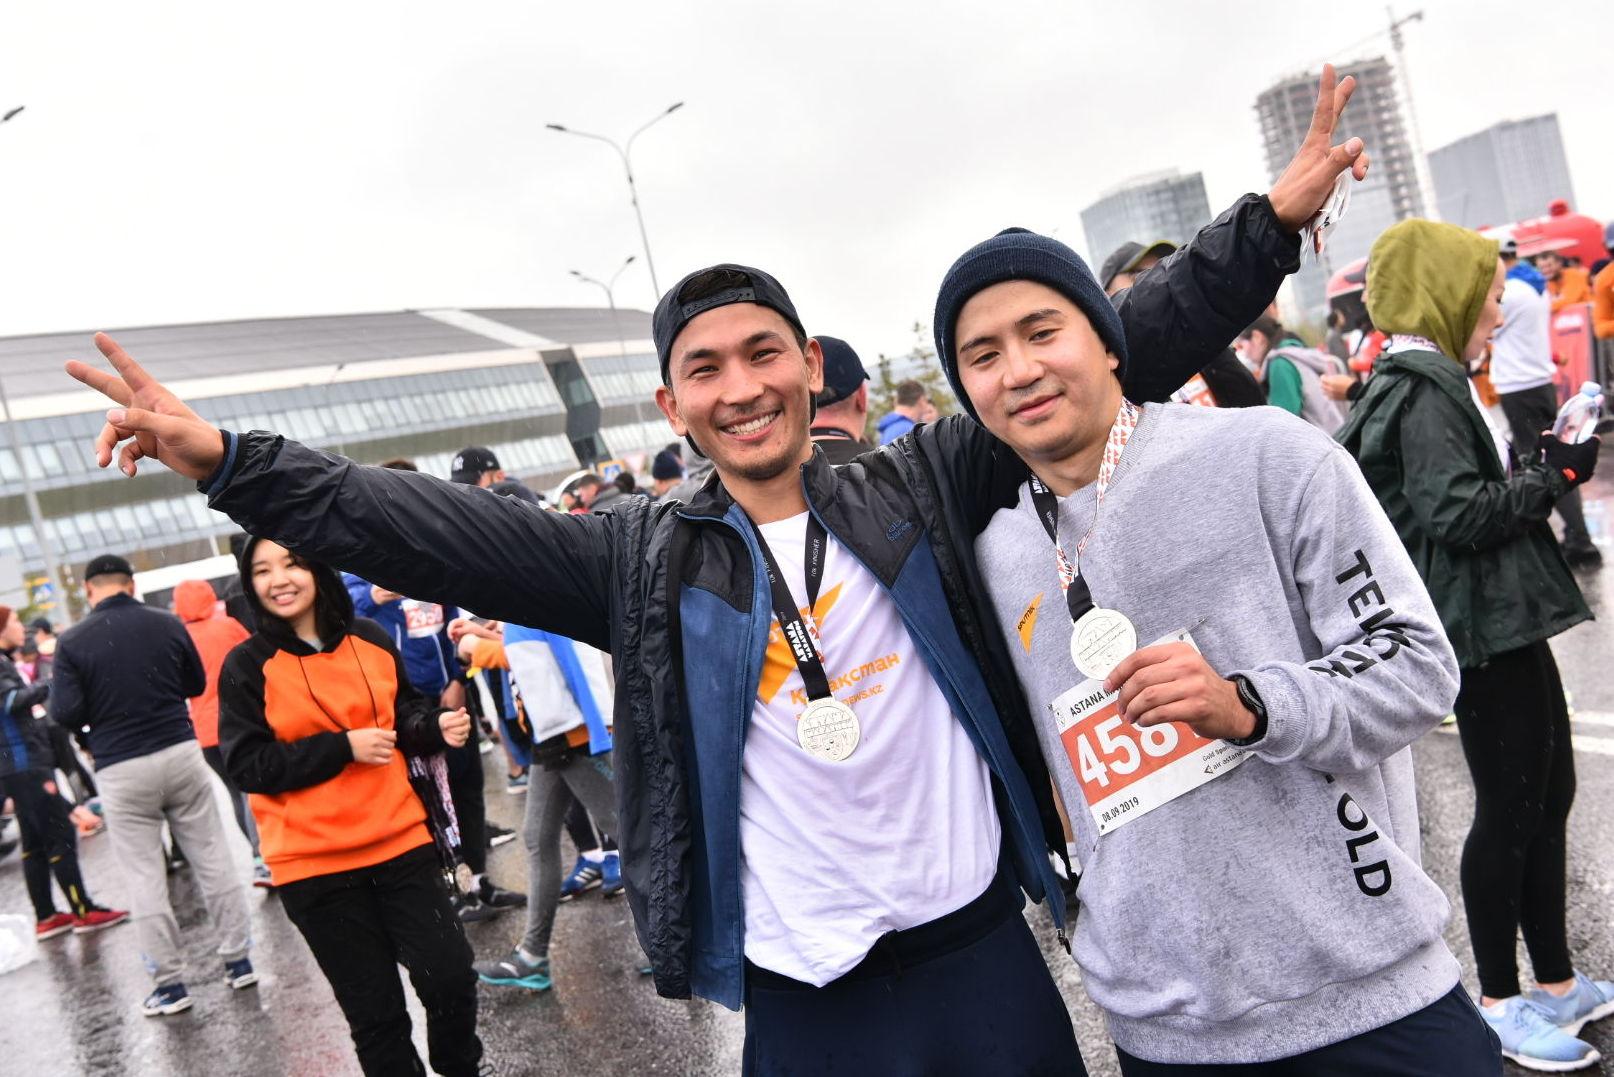 Сотрудники агентства Sputnik Казахстан Абзал Калиев и Даурен Ерболатов после преодоления марафона